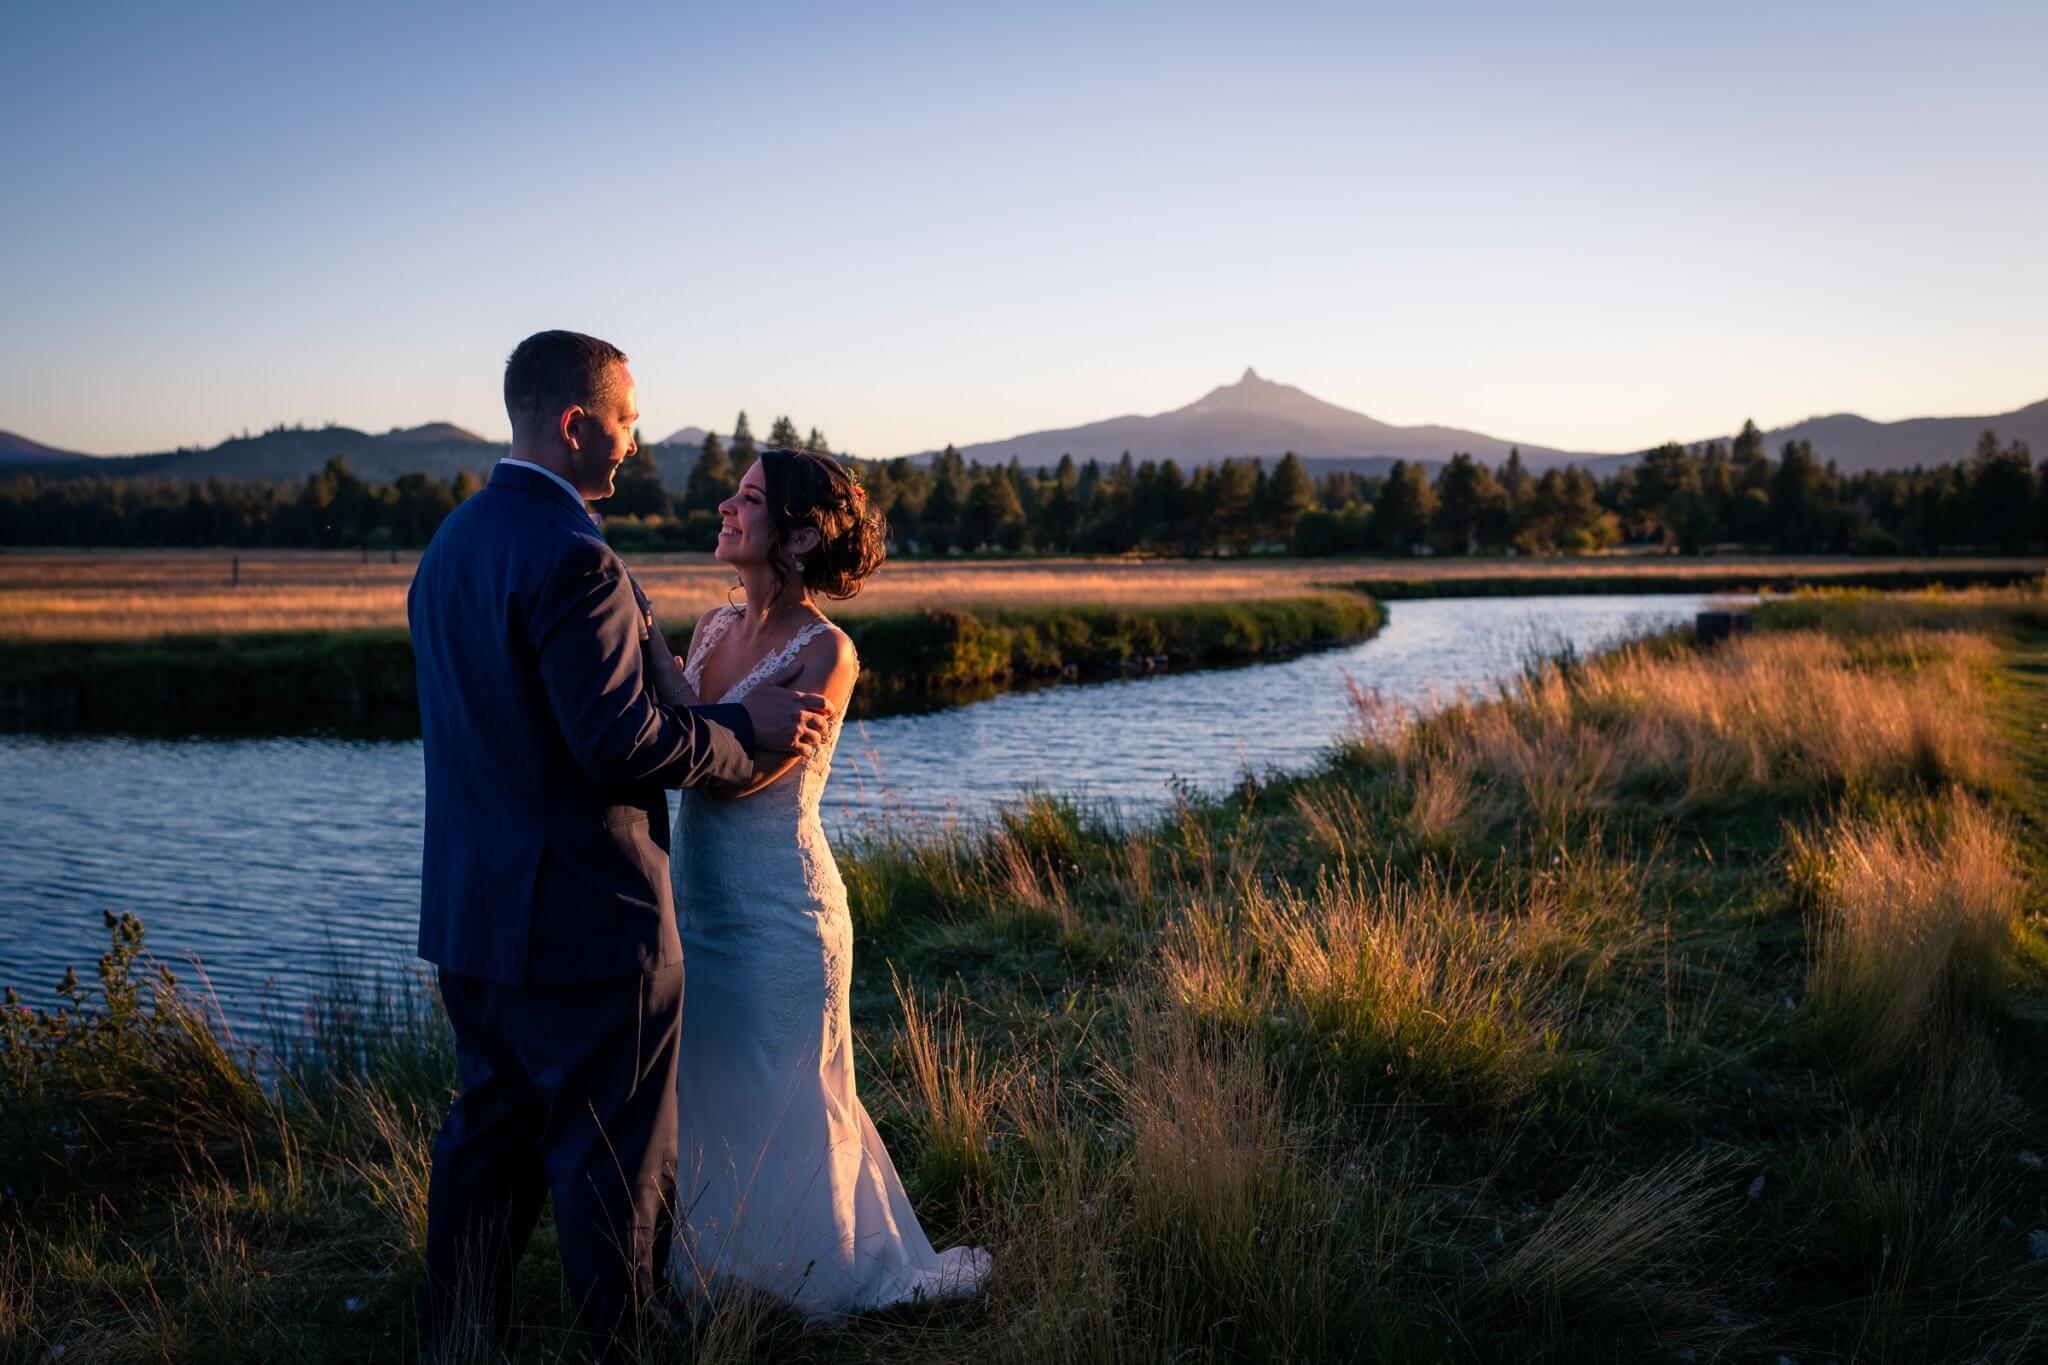 sisters-oregon-wedding-photographers-41-2048x1365 - Copy.jpg